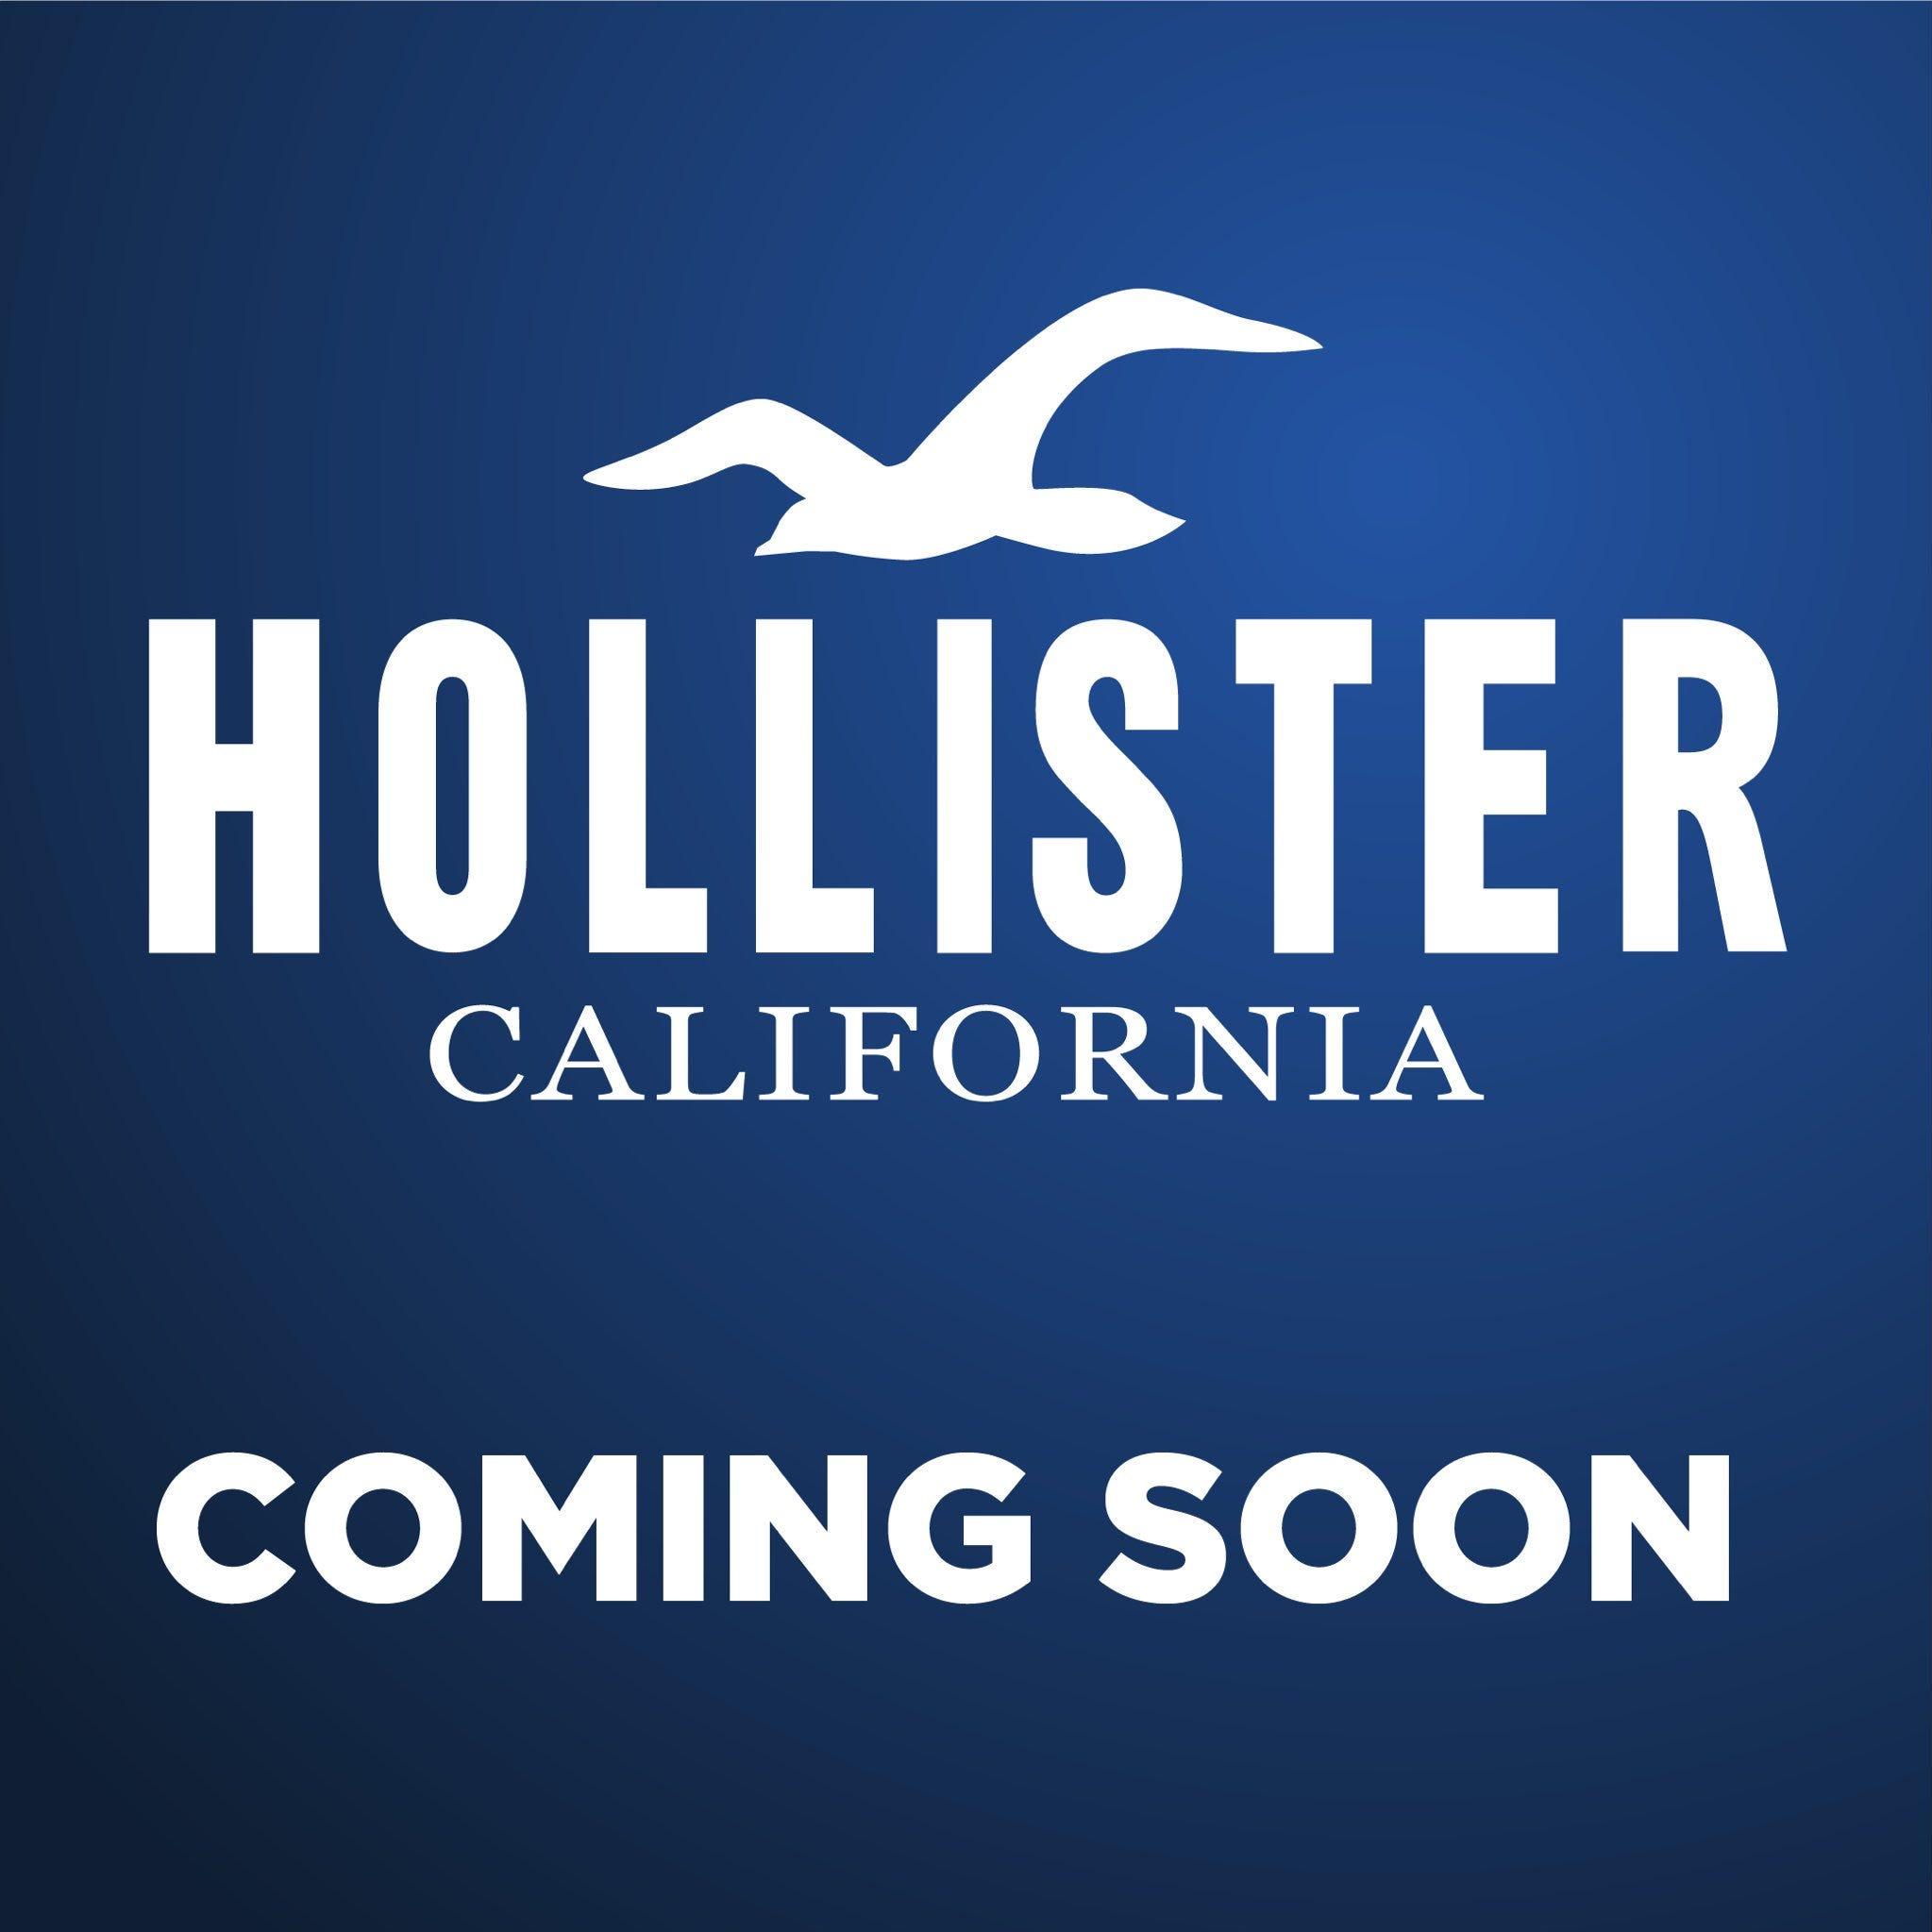 Corpus Christi's La Palmera mall confirms Hollister store opening before Christmas